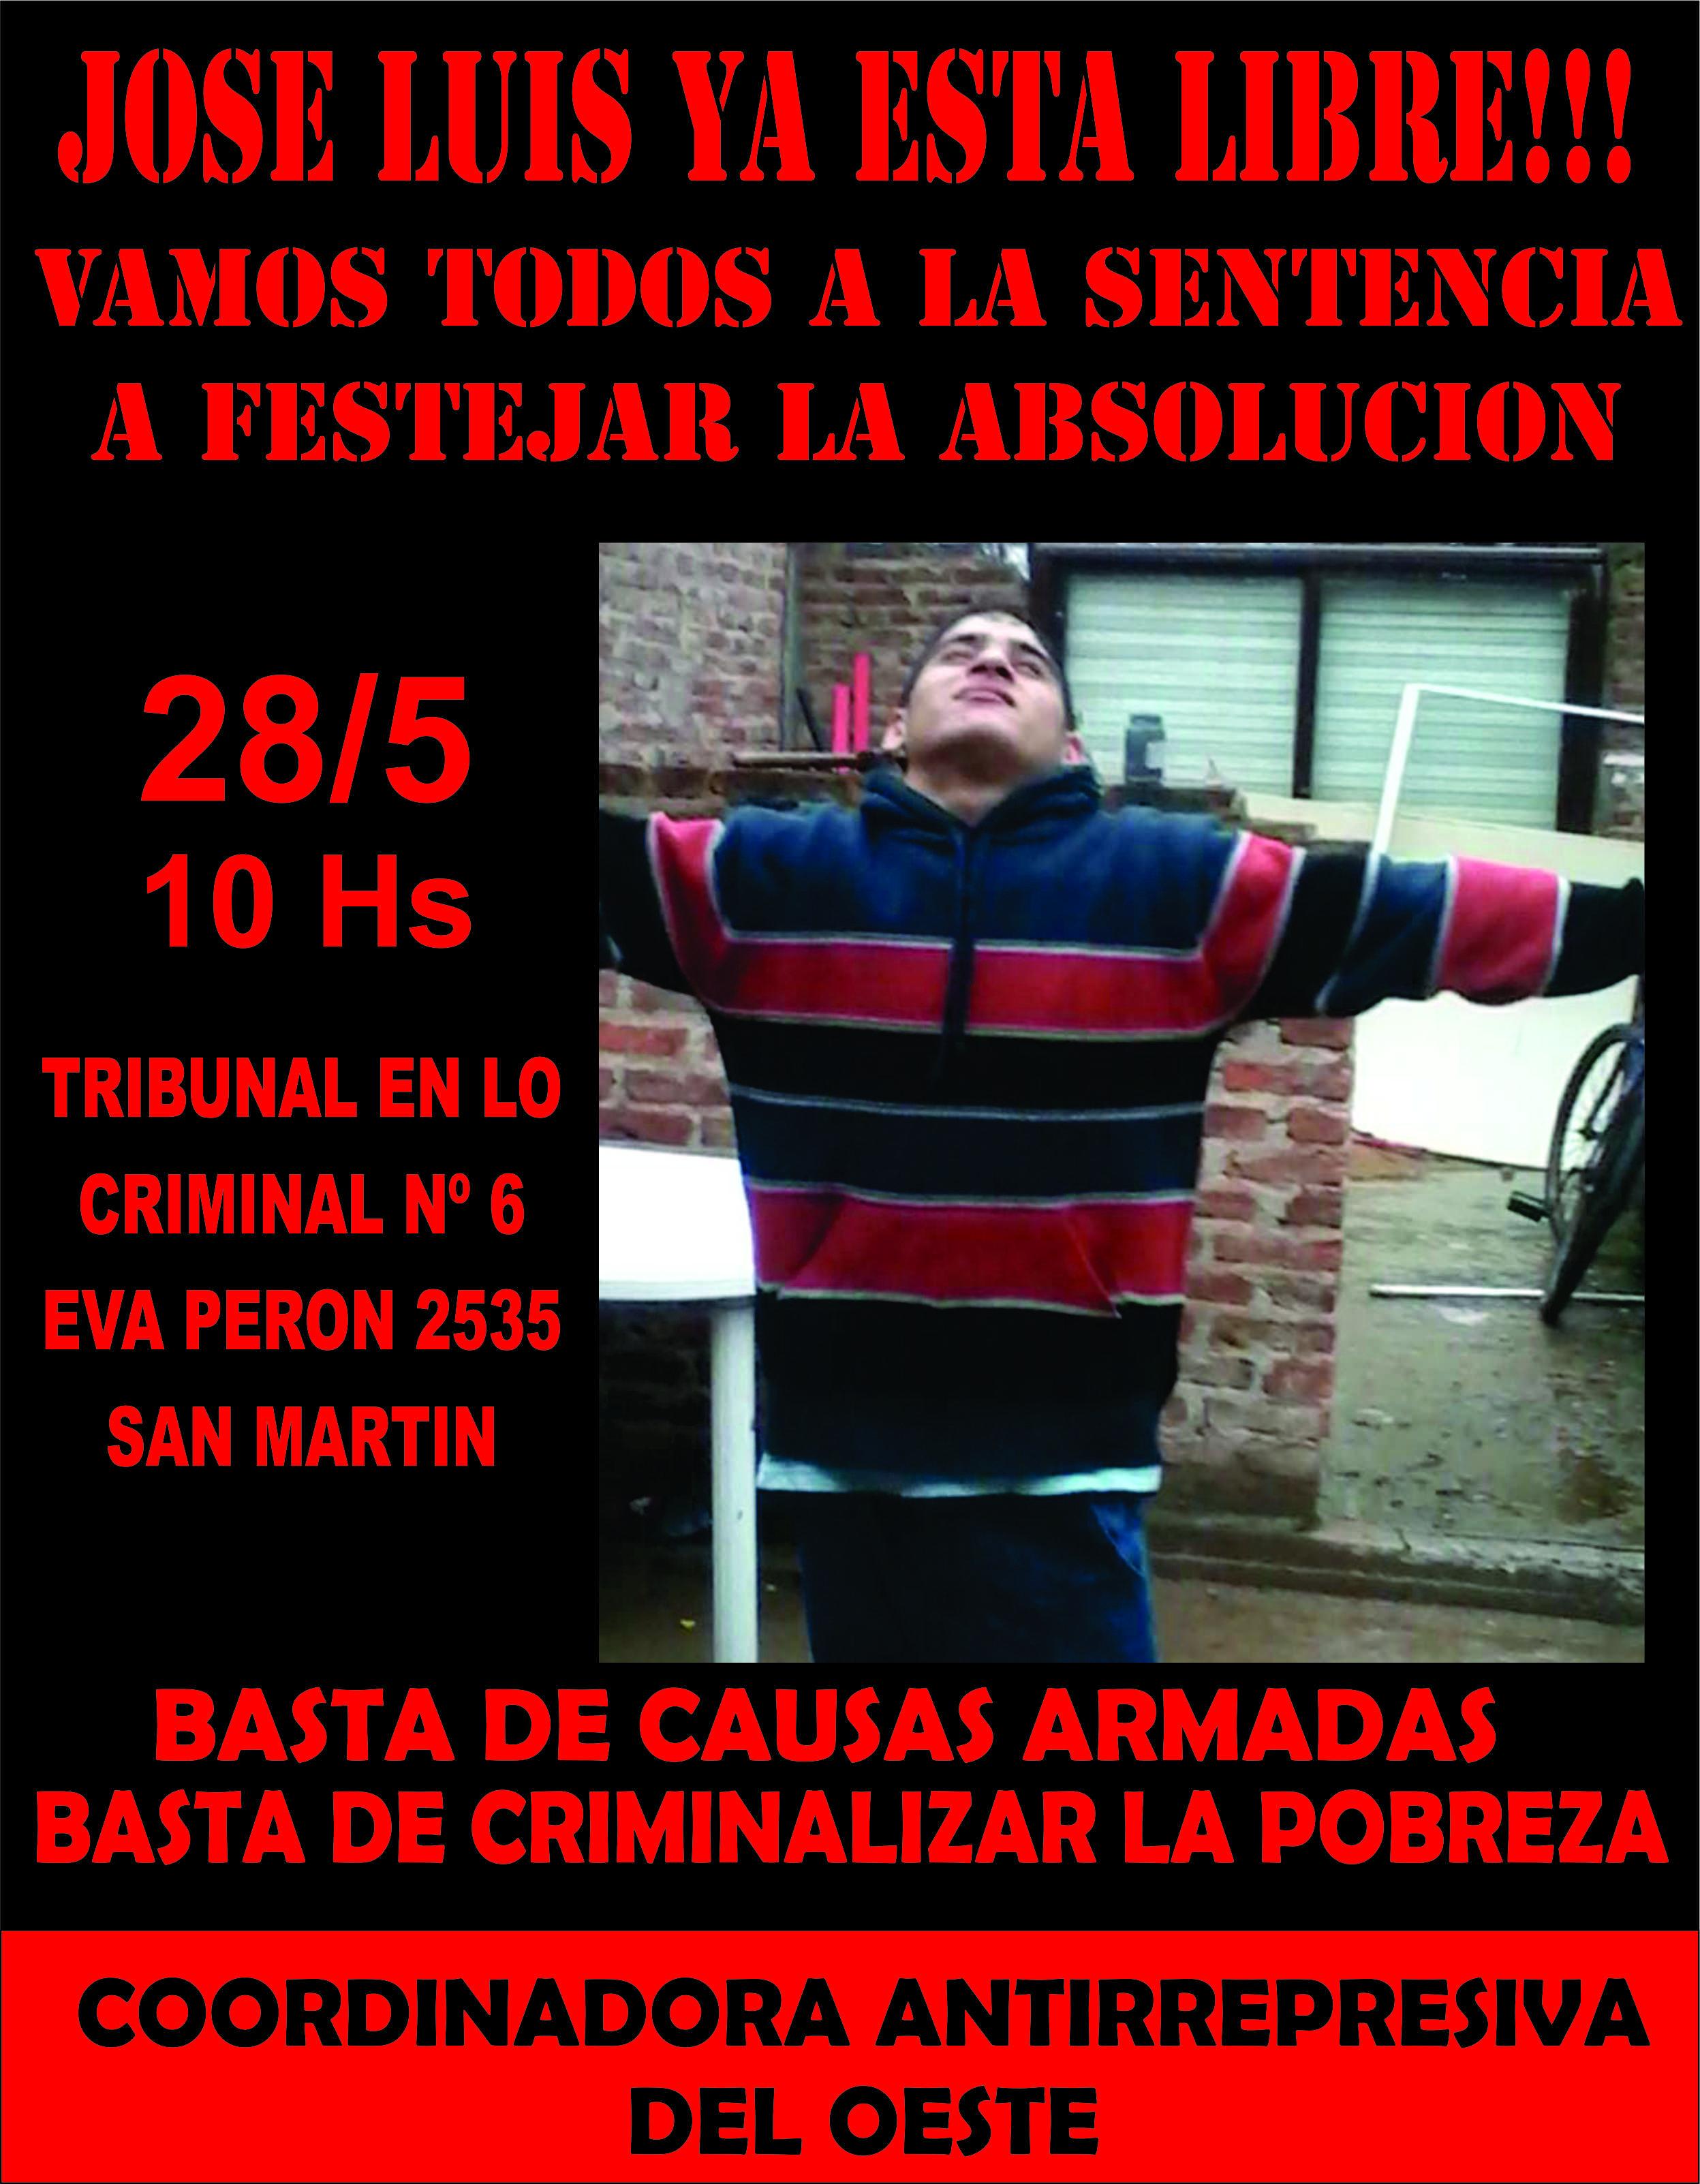 Sentencia absolutoria para José Luis Orellana